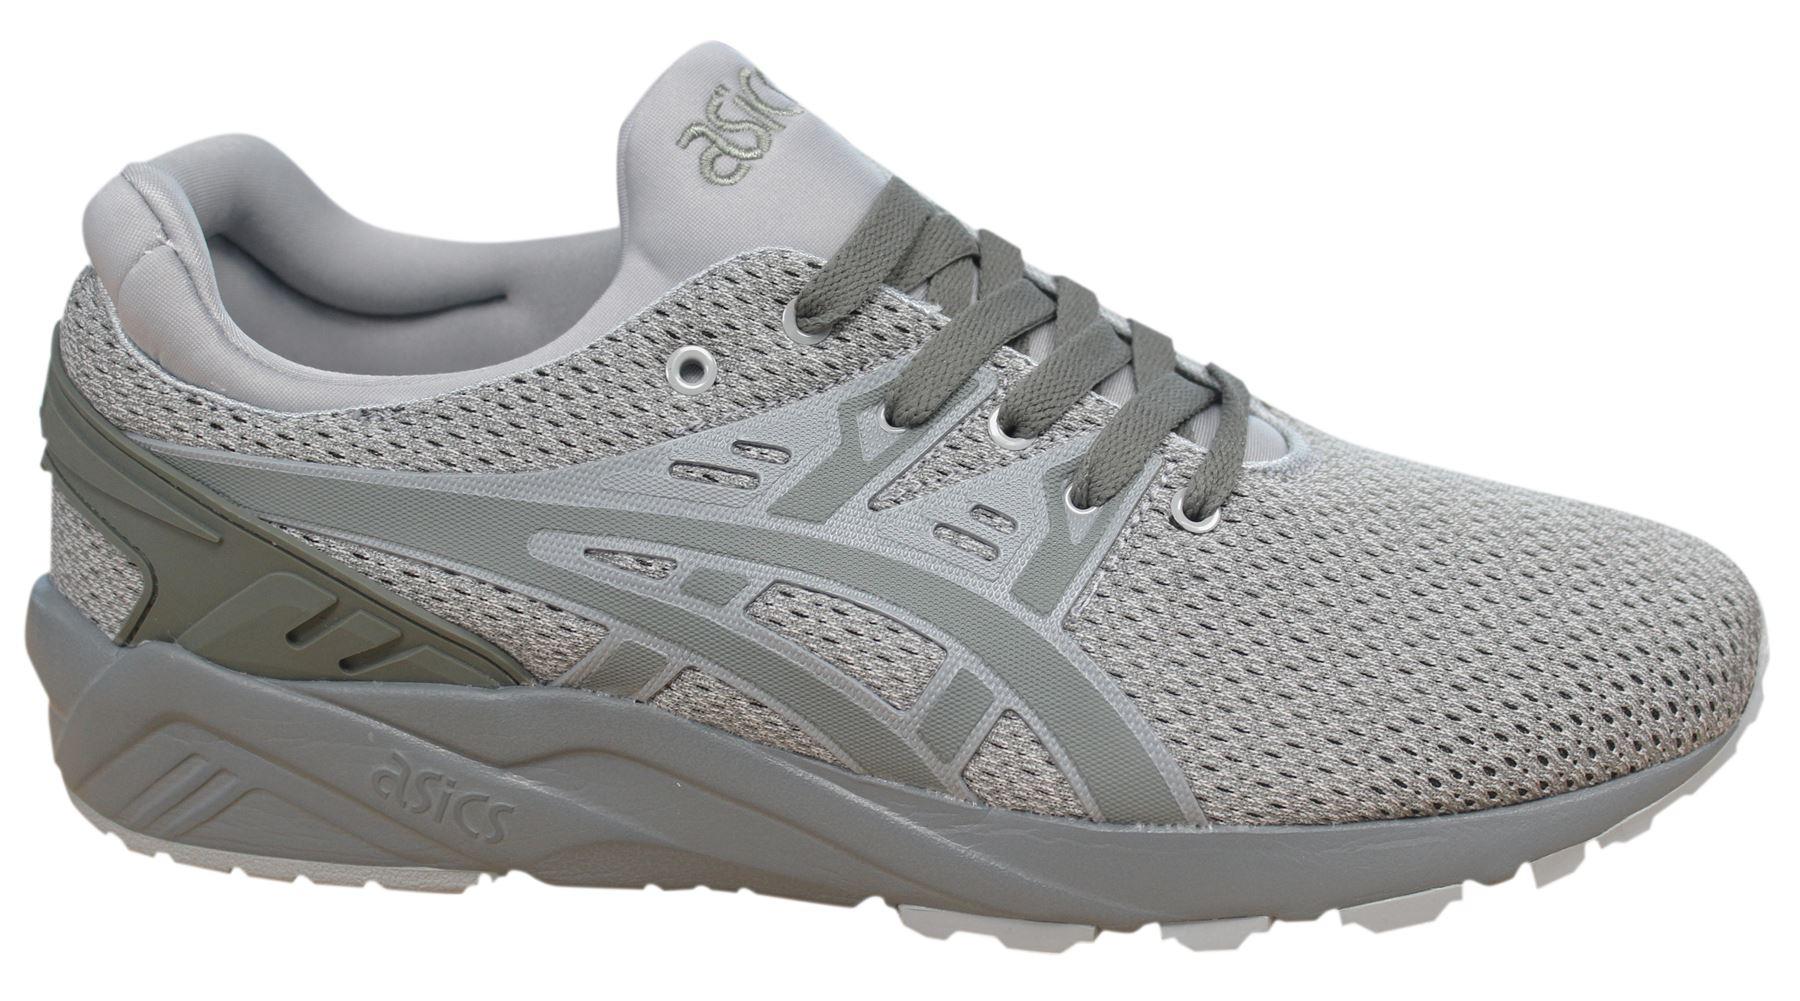 ASICS Gel Kayano EVO Lacci Grigio Sneaker Uomo Sintetico H742N 8181 M16